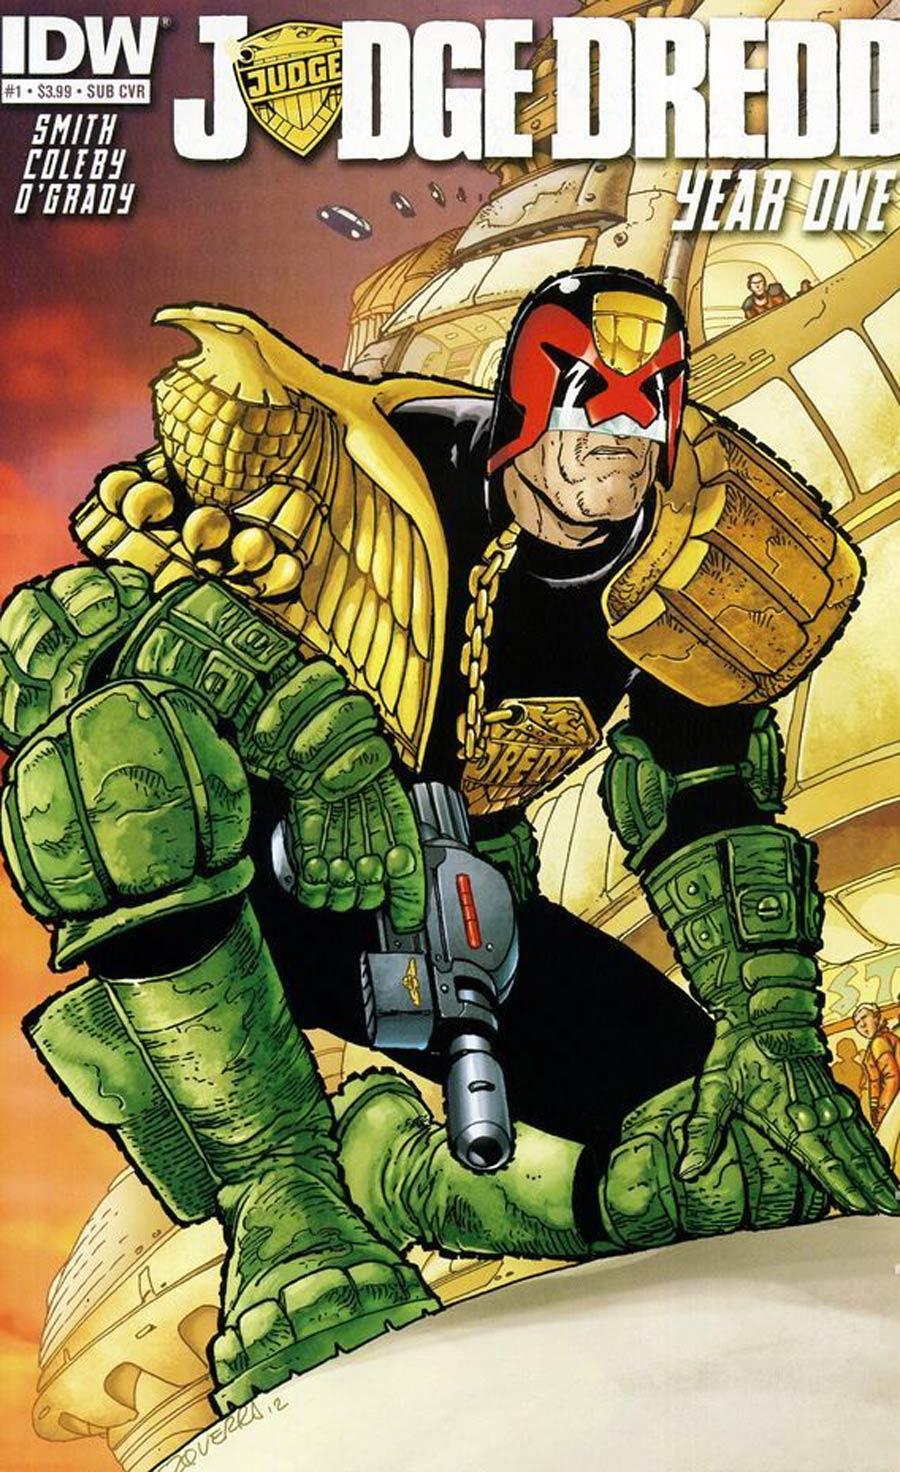 Judge Dredd Year One #1 Variant Carlos Ezquerra Subscription Cover